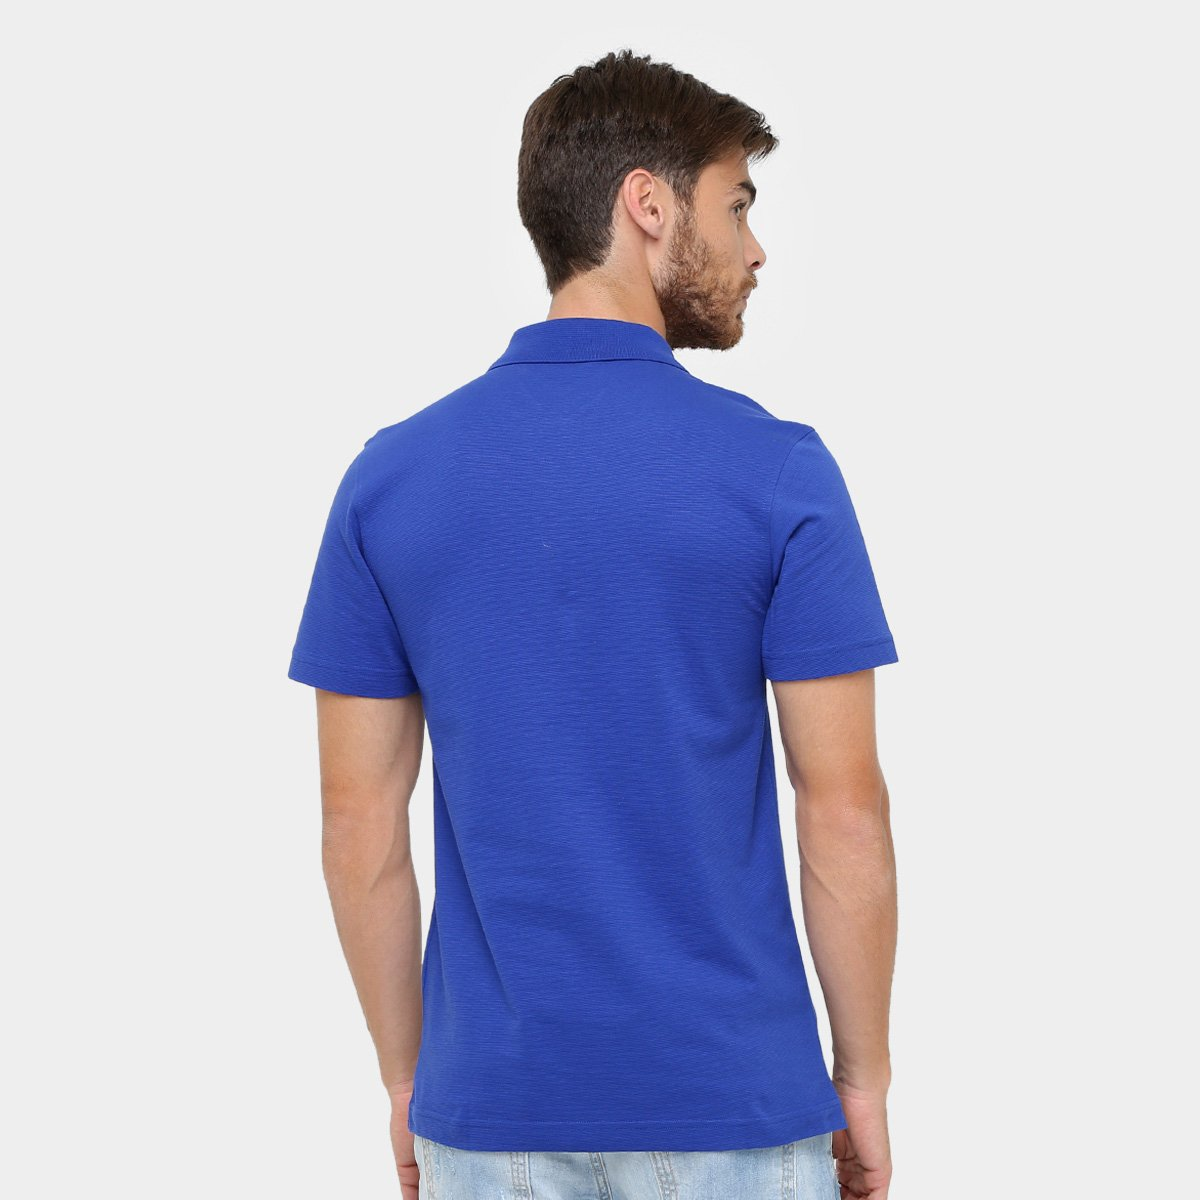 Camisa Polo Lacoste Super Light Masculina - Azul e Branco - Compre ... ceec2ae776